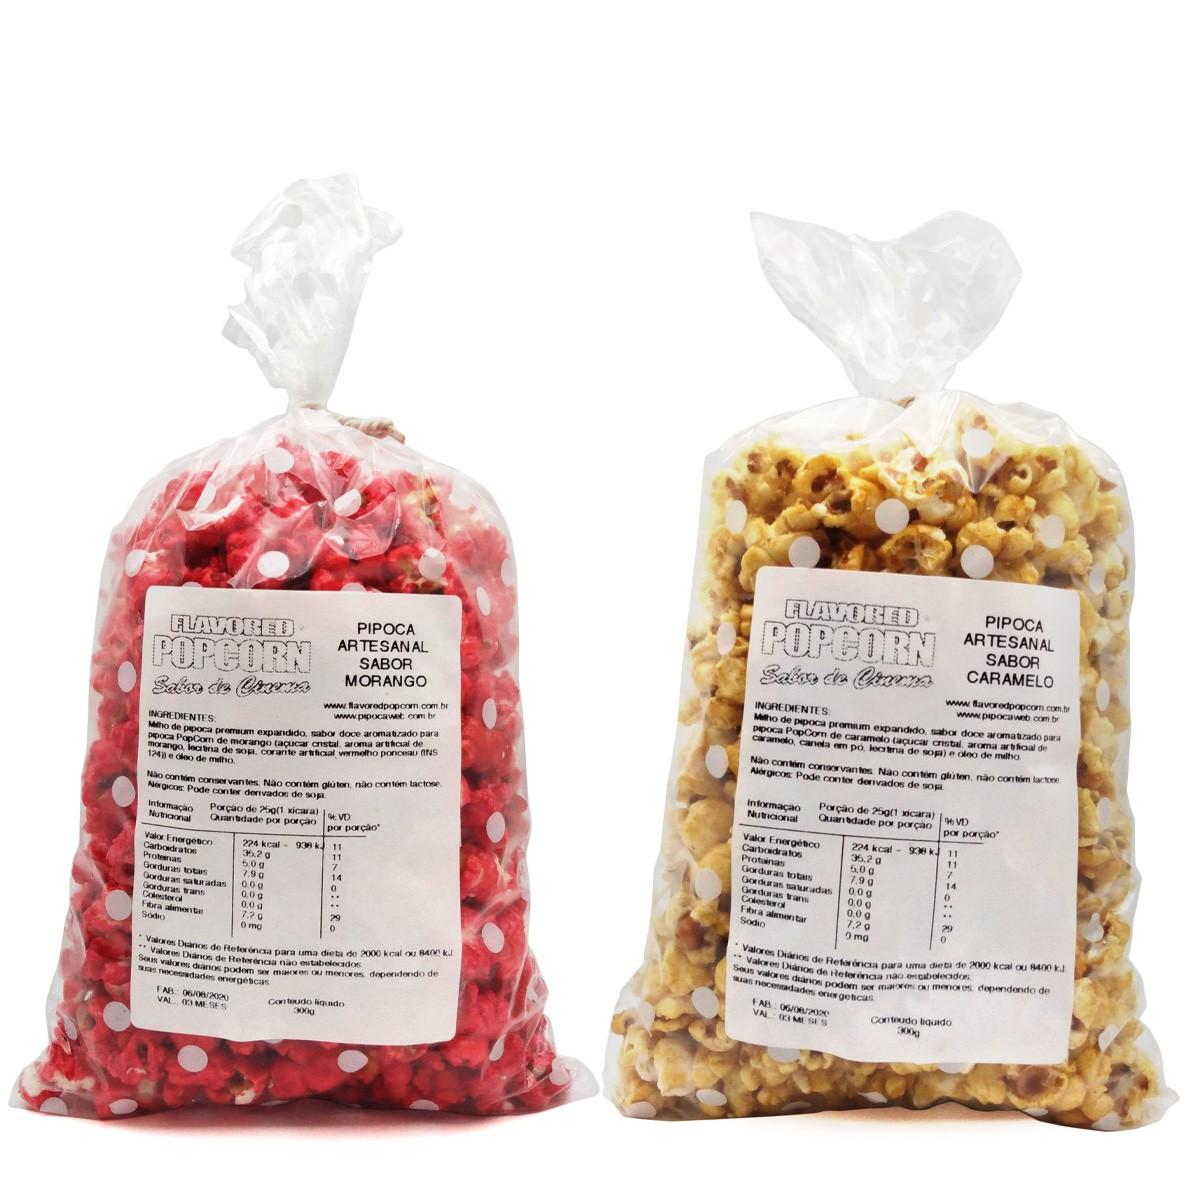 Pipoca Artesanal Popcorn - 18 Sabores Doces e 21 Sabores Salgados